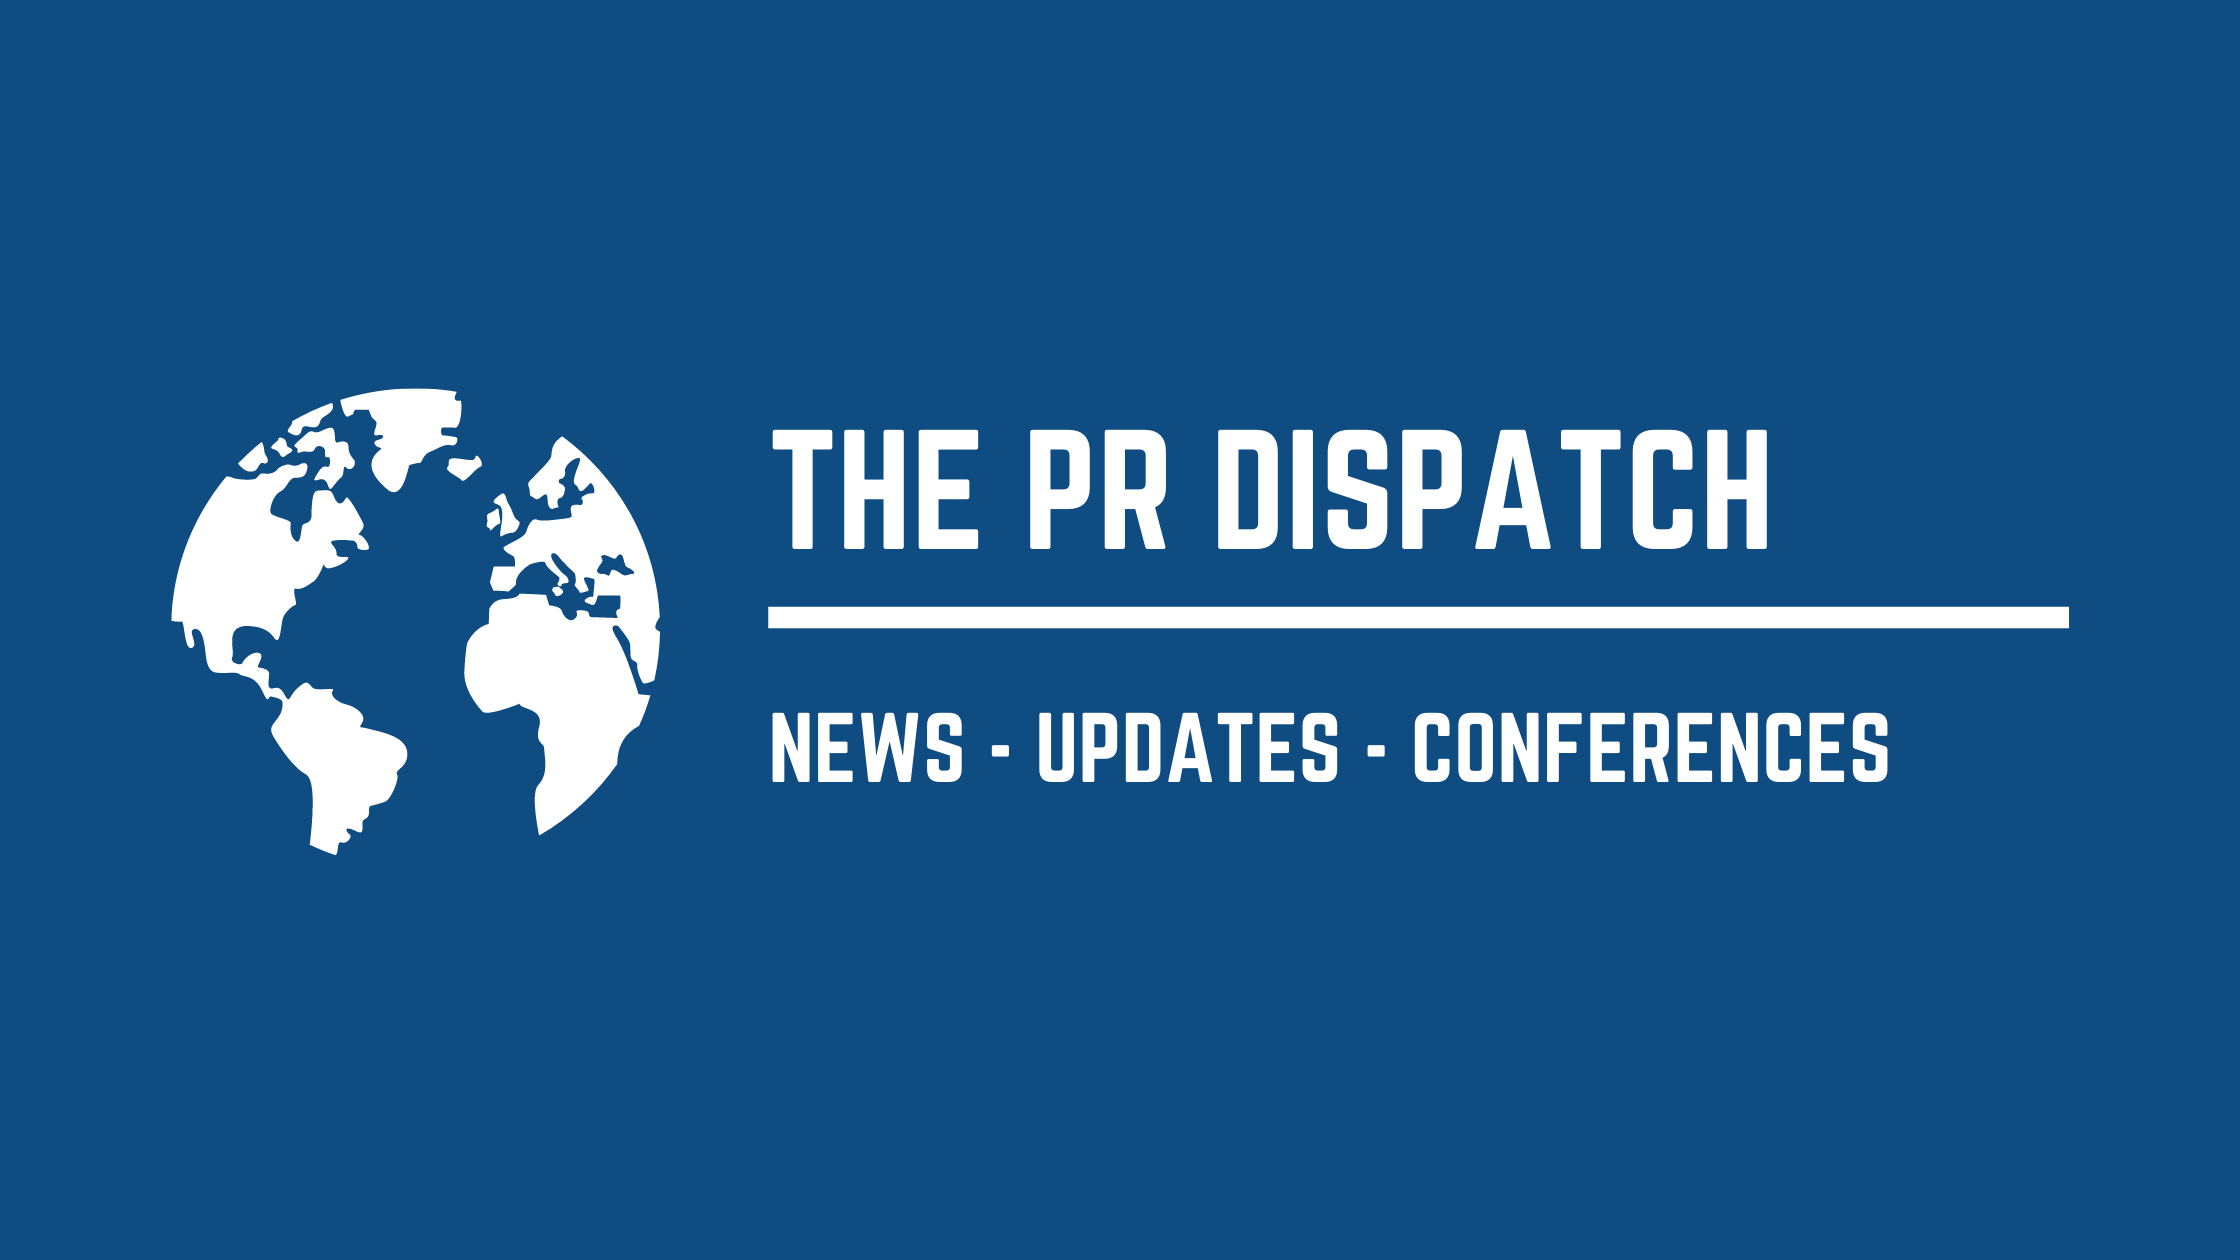 The PR Dispatch